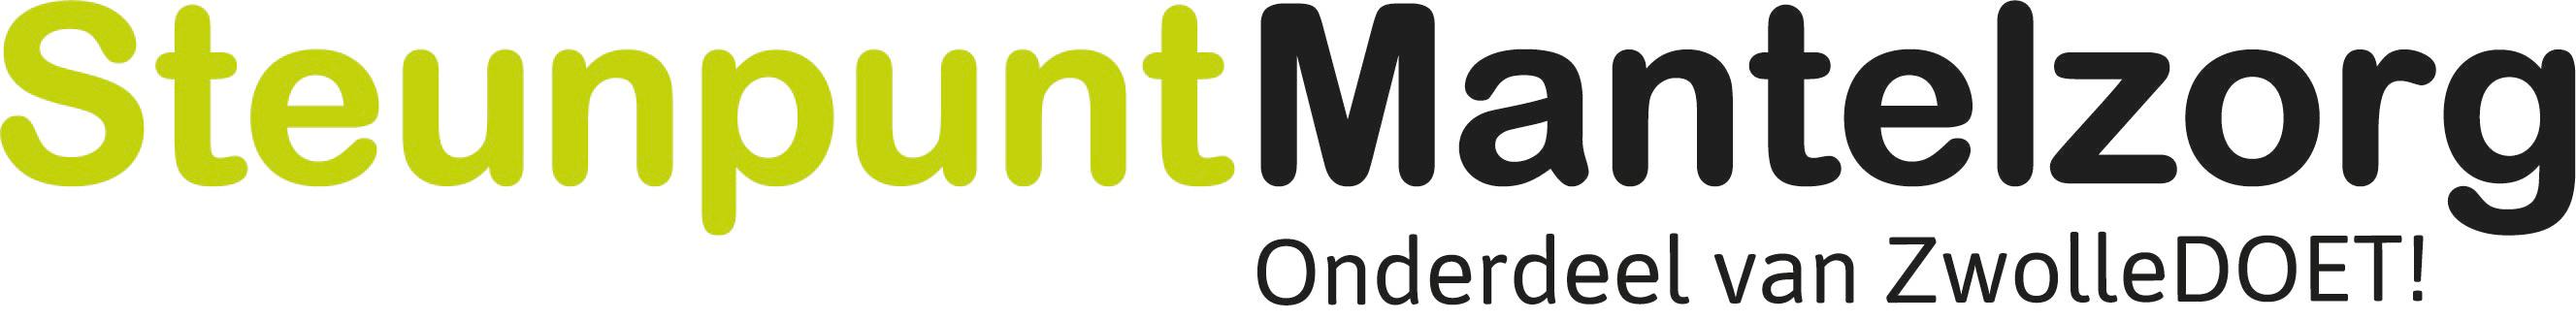 ZwolleDoet! logo